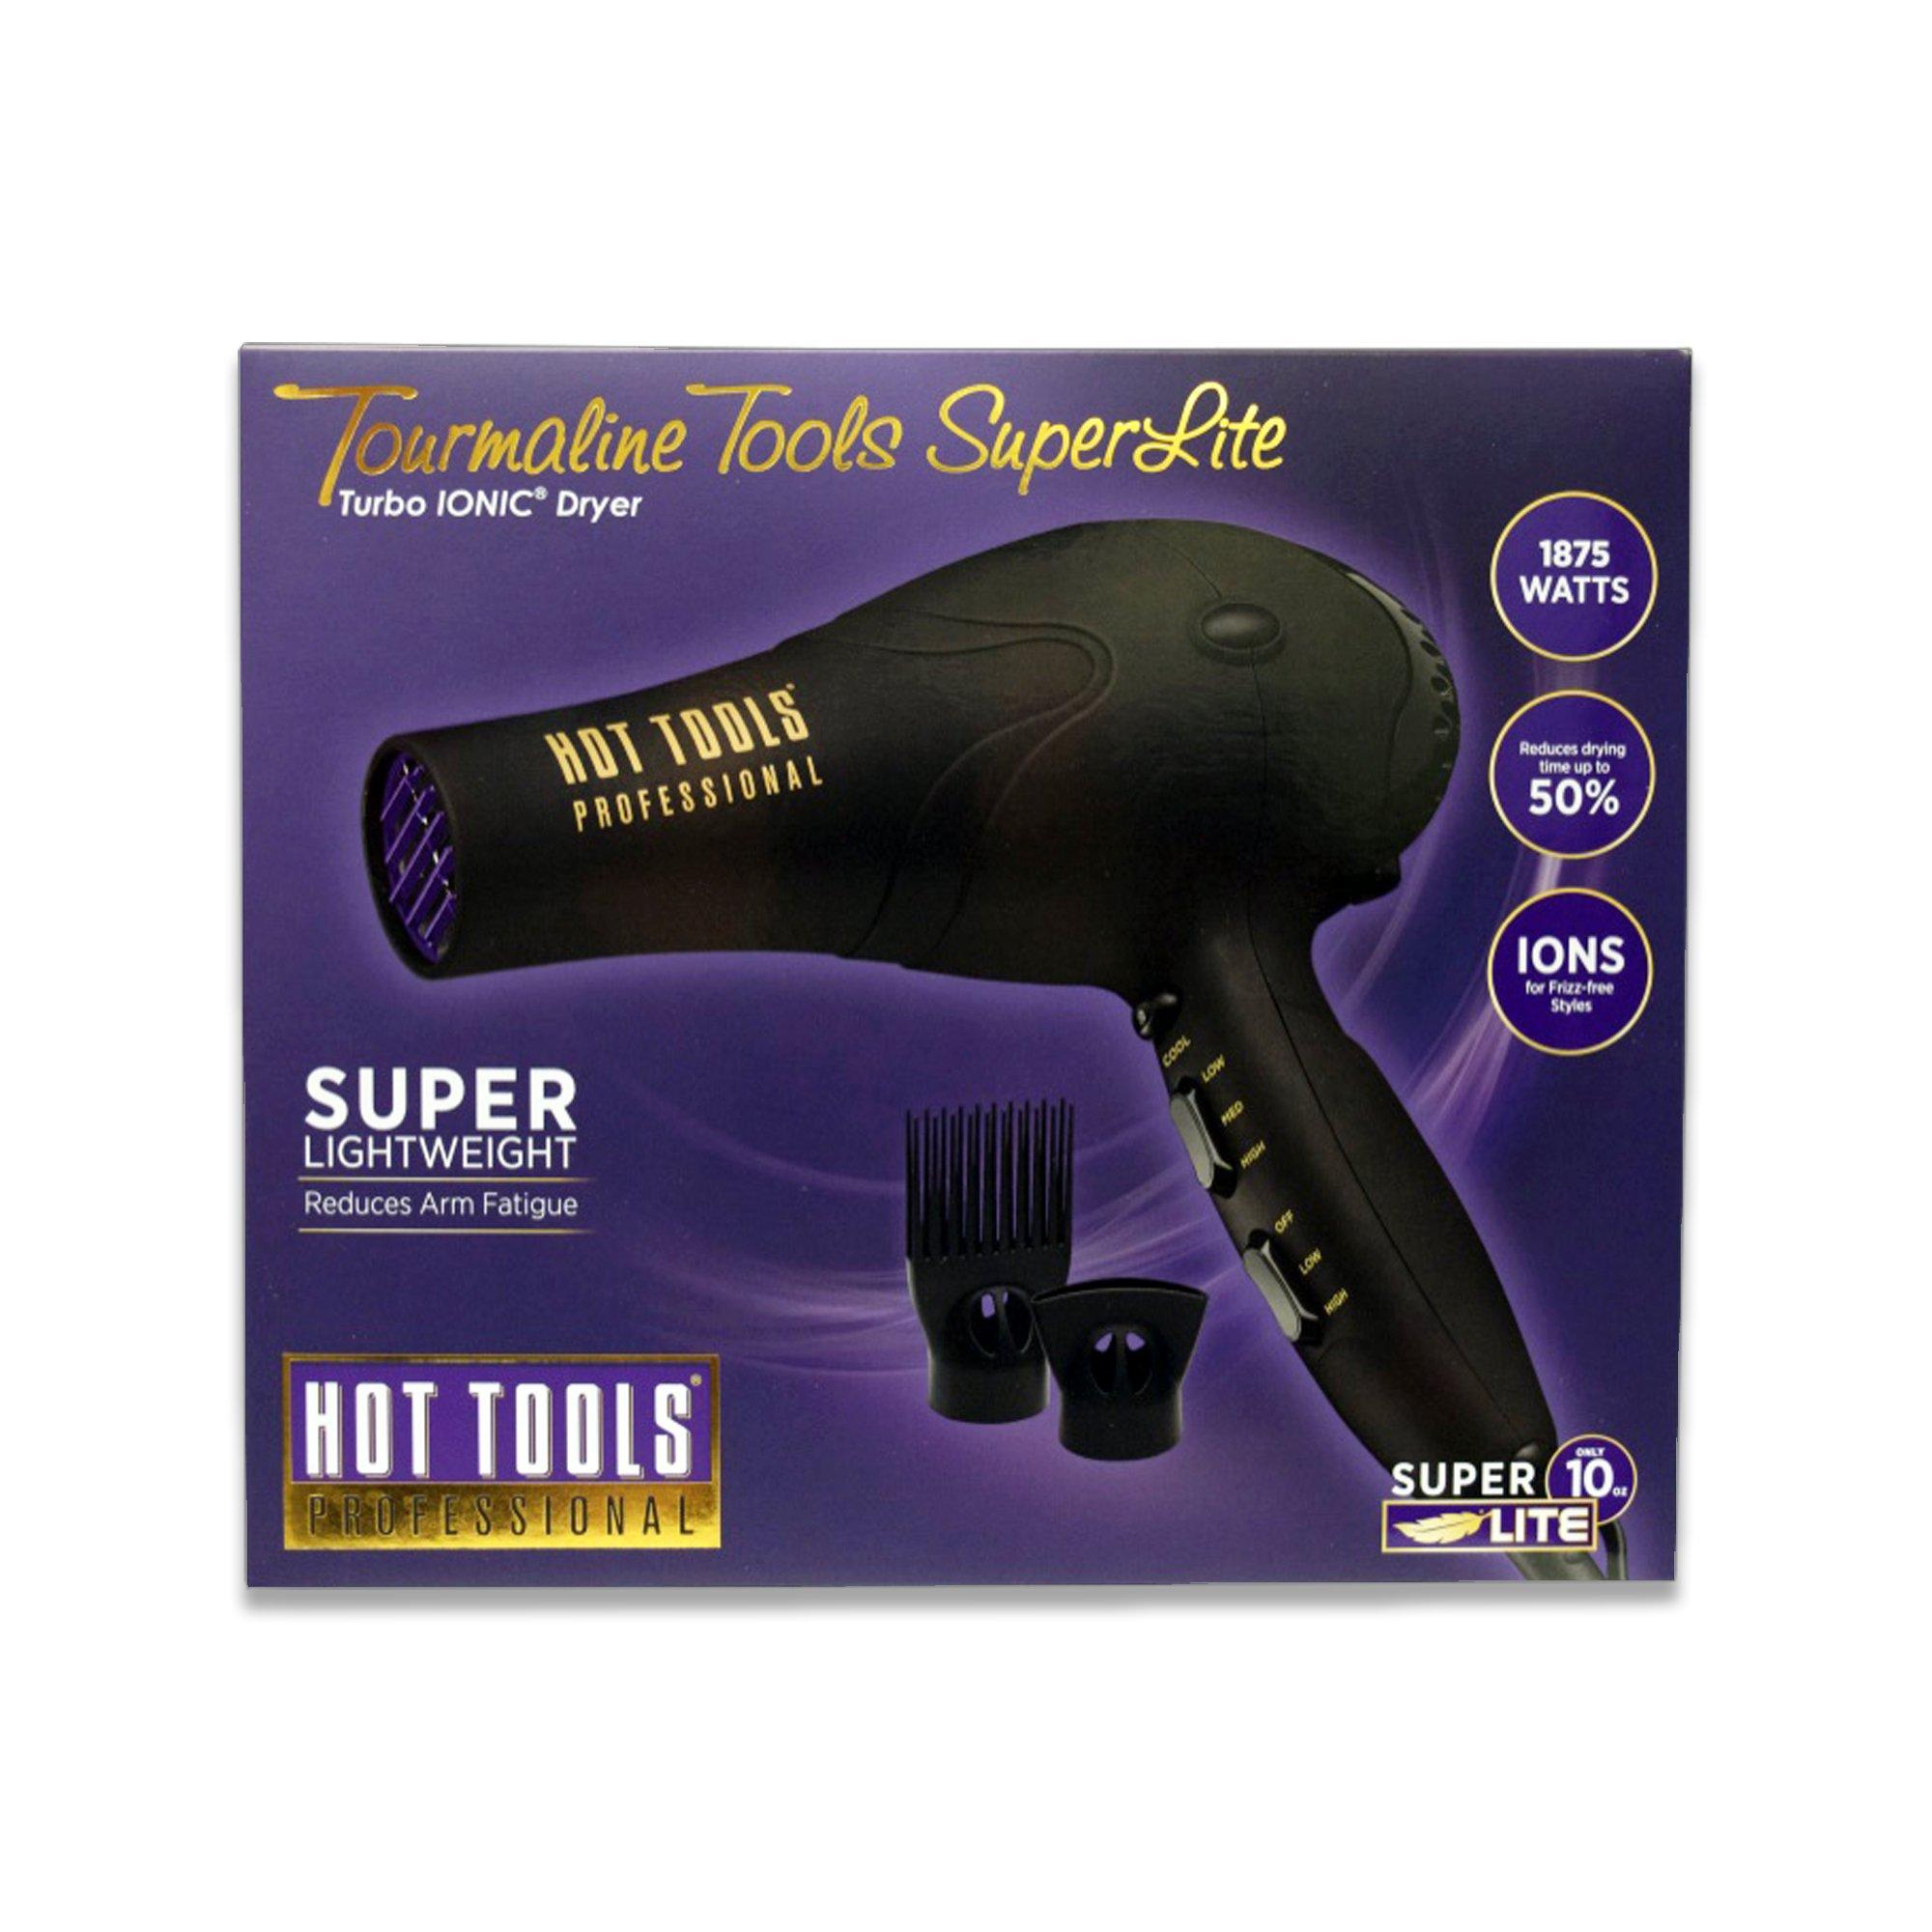 80c245b0734b Get Quotations · Hot Tools Tourmaline Tools Superlite Turbo Ionic Dryer  Light Weight 1875 Watts HT7030D